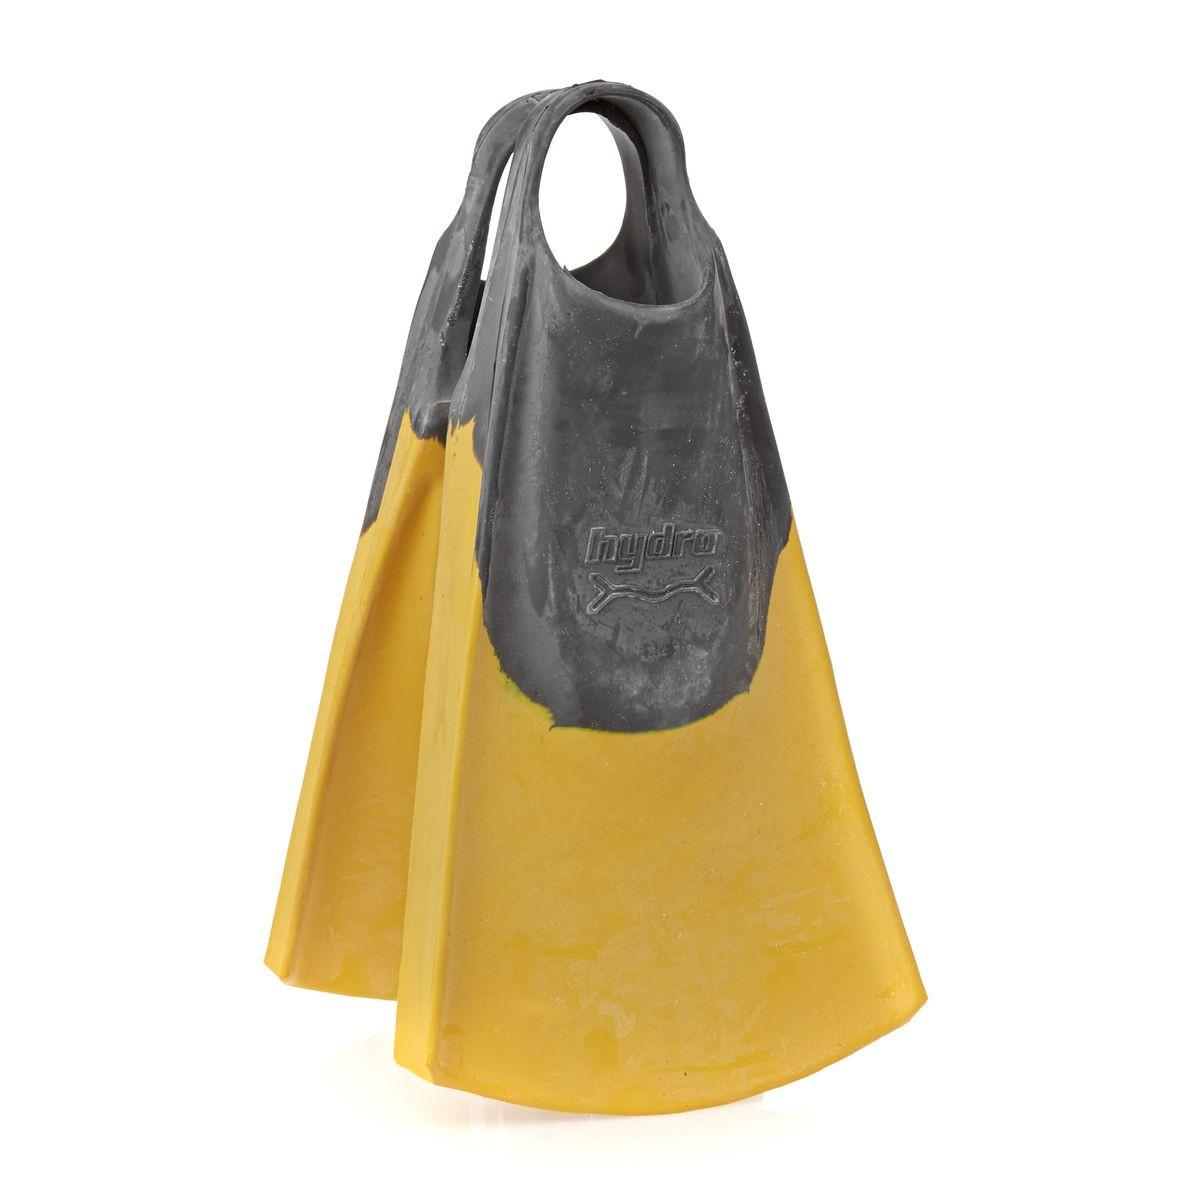 Hydro Original - Grey/yellow